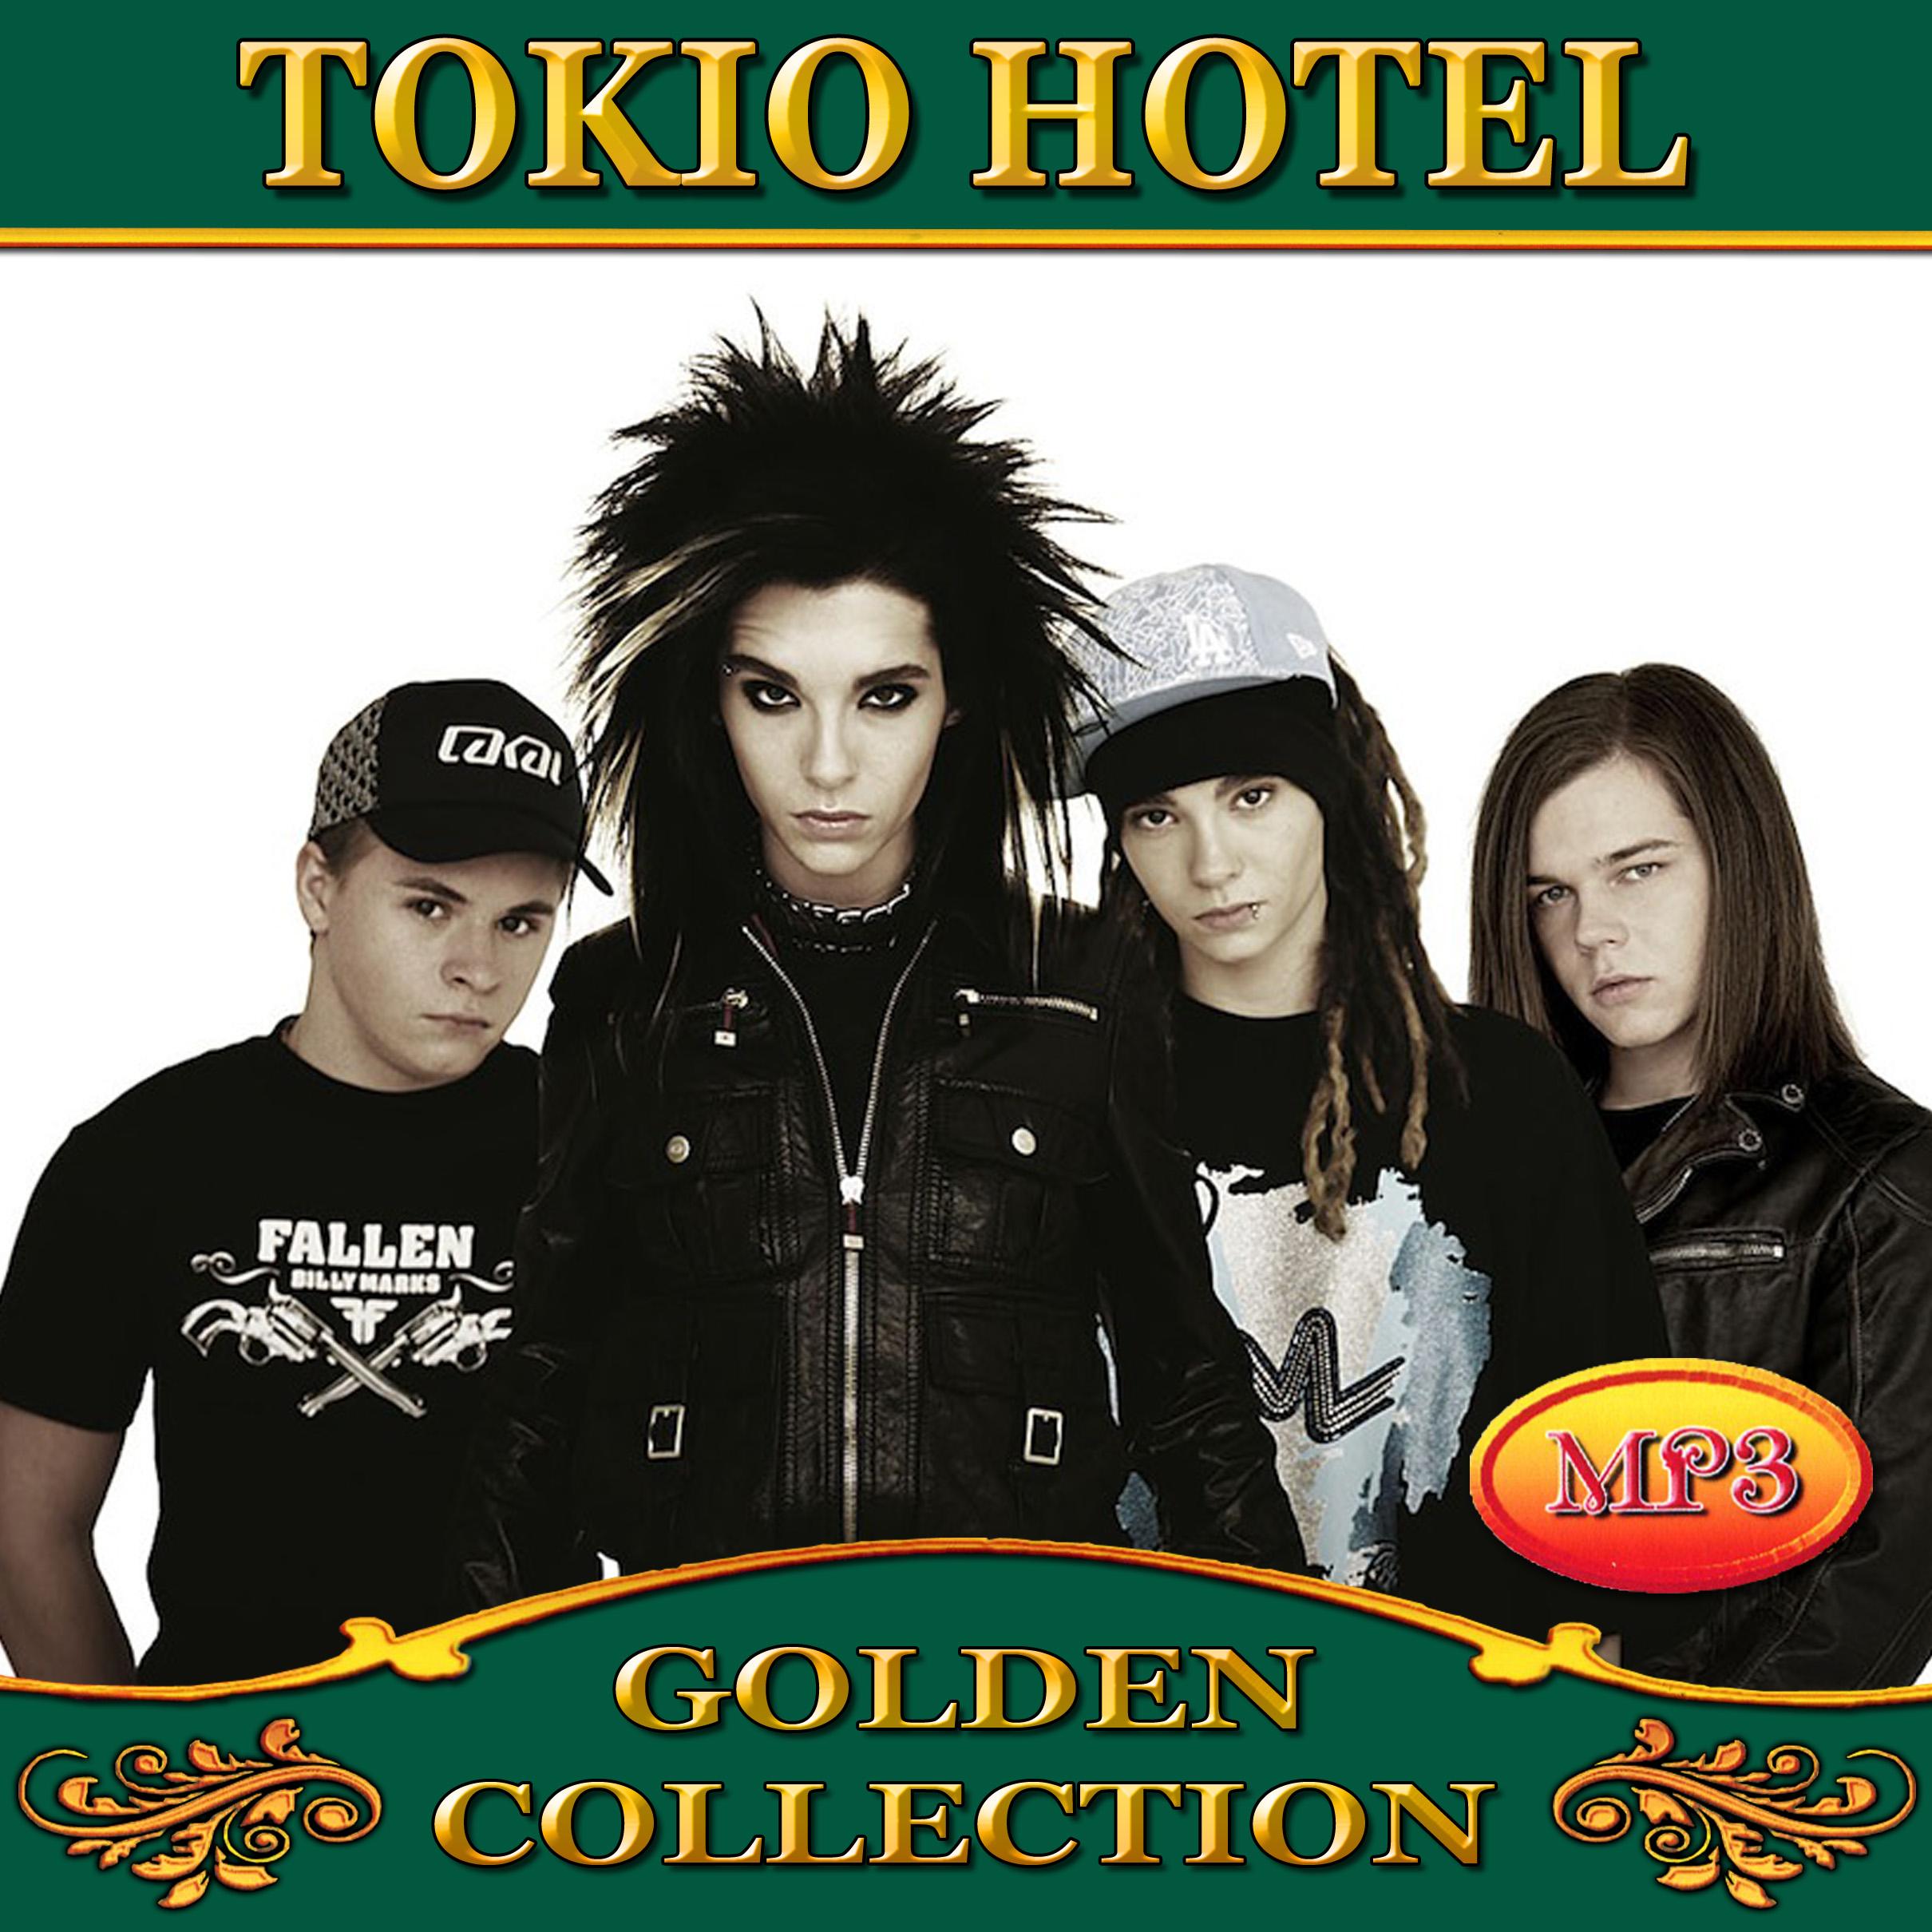 Tokio Hotel [mp3]